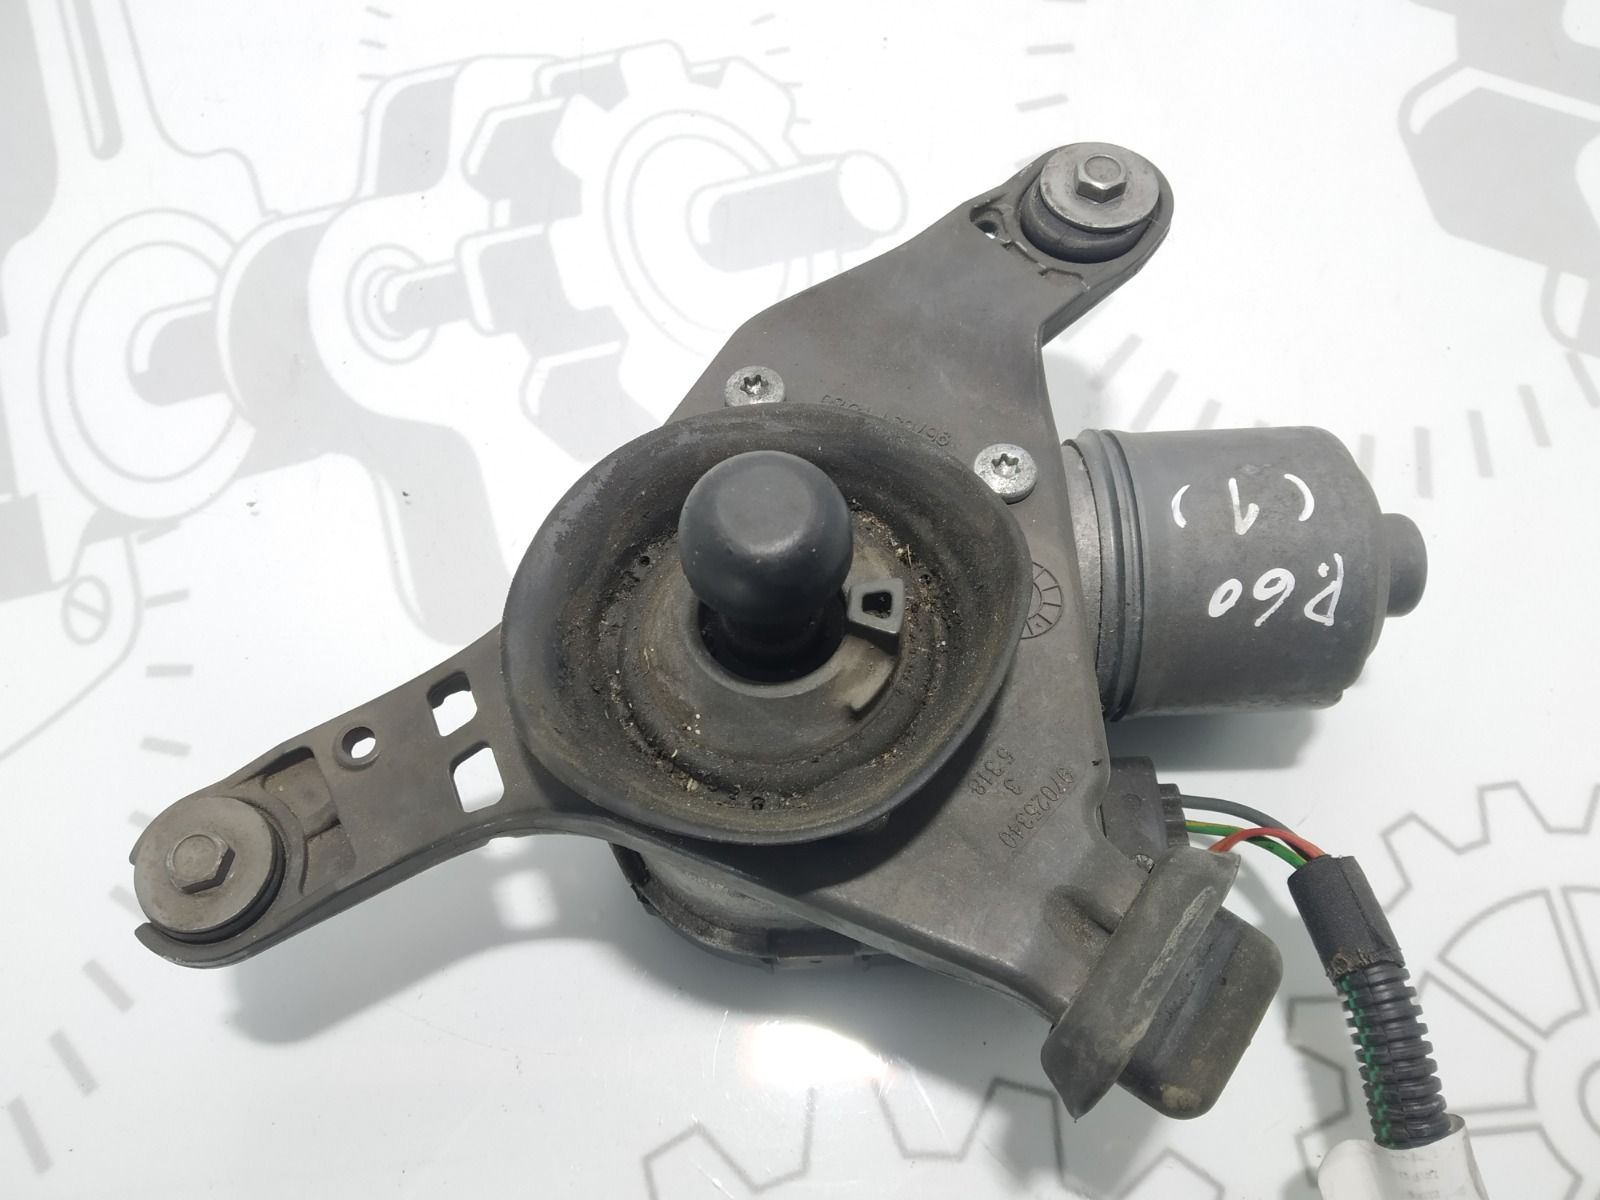 Моторчик передних стеклоочистителей (дворников) Citroen C4 Grand Picasso 1.6 HDI 2014 (б/у)